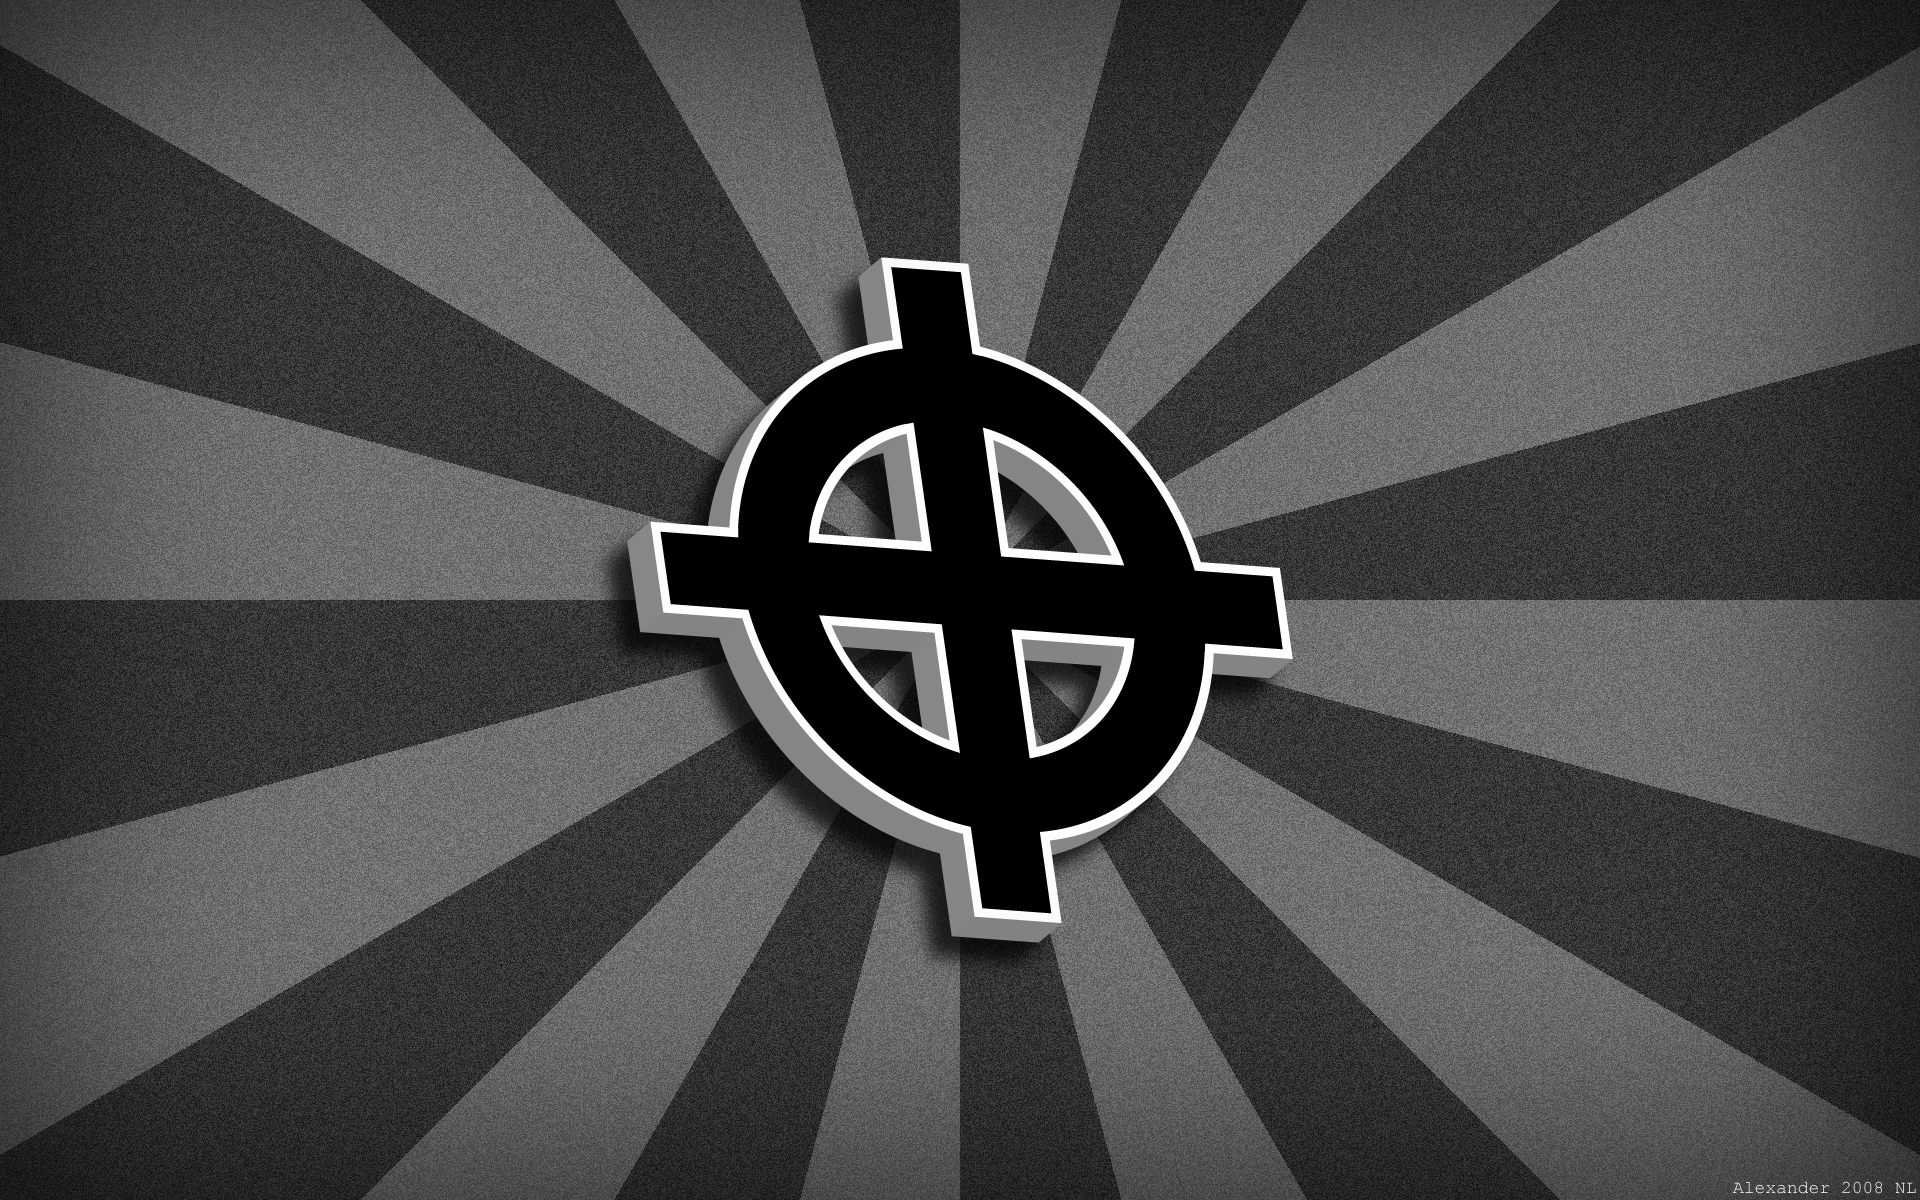 Images of Celtic Cross Flag | 1920x1200